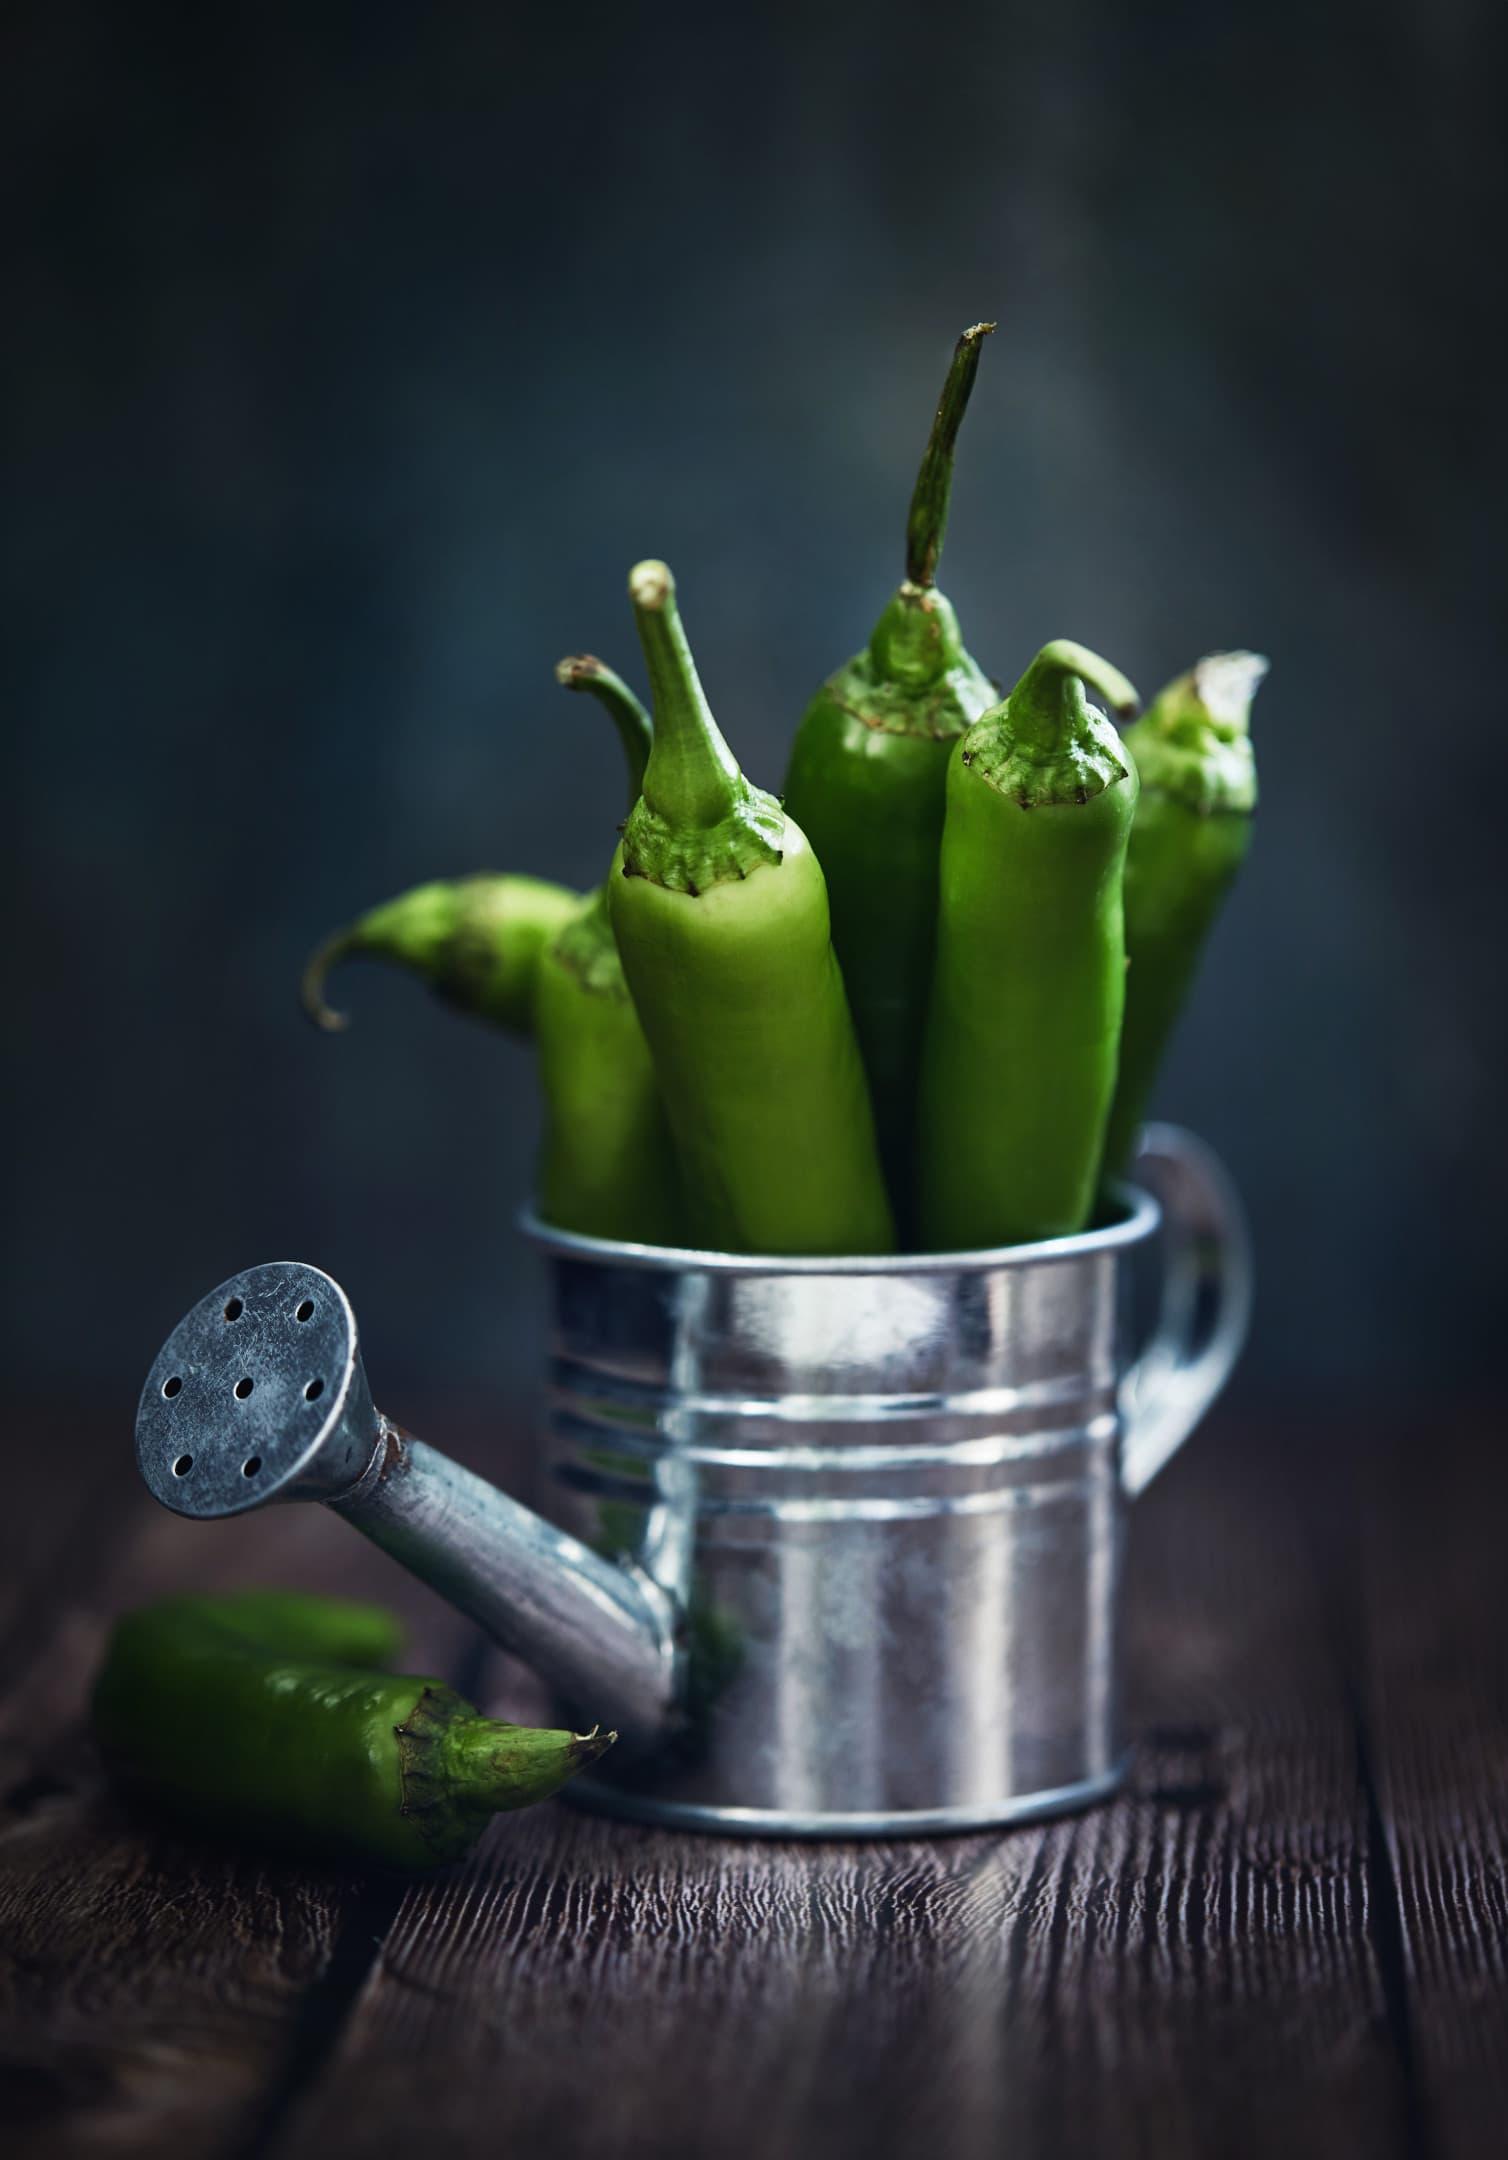 Green hot serrano peppers